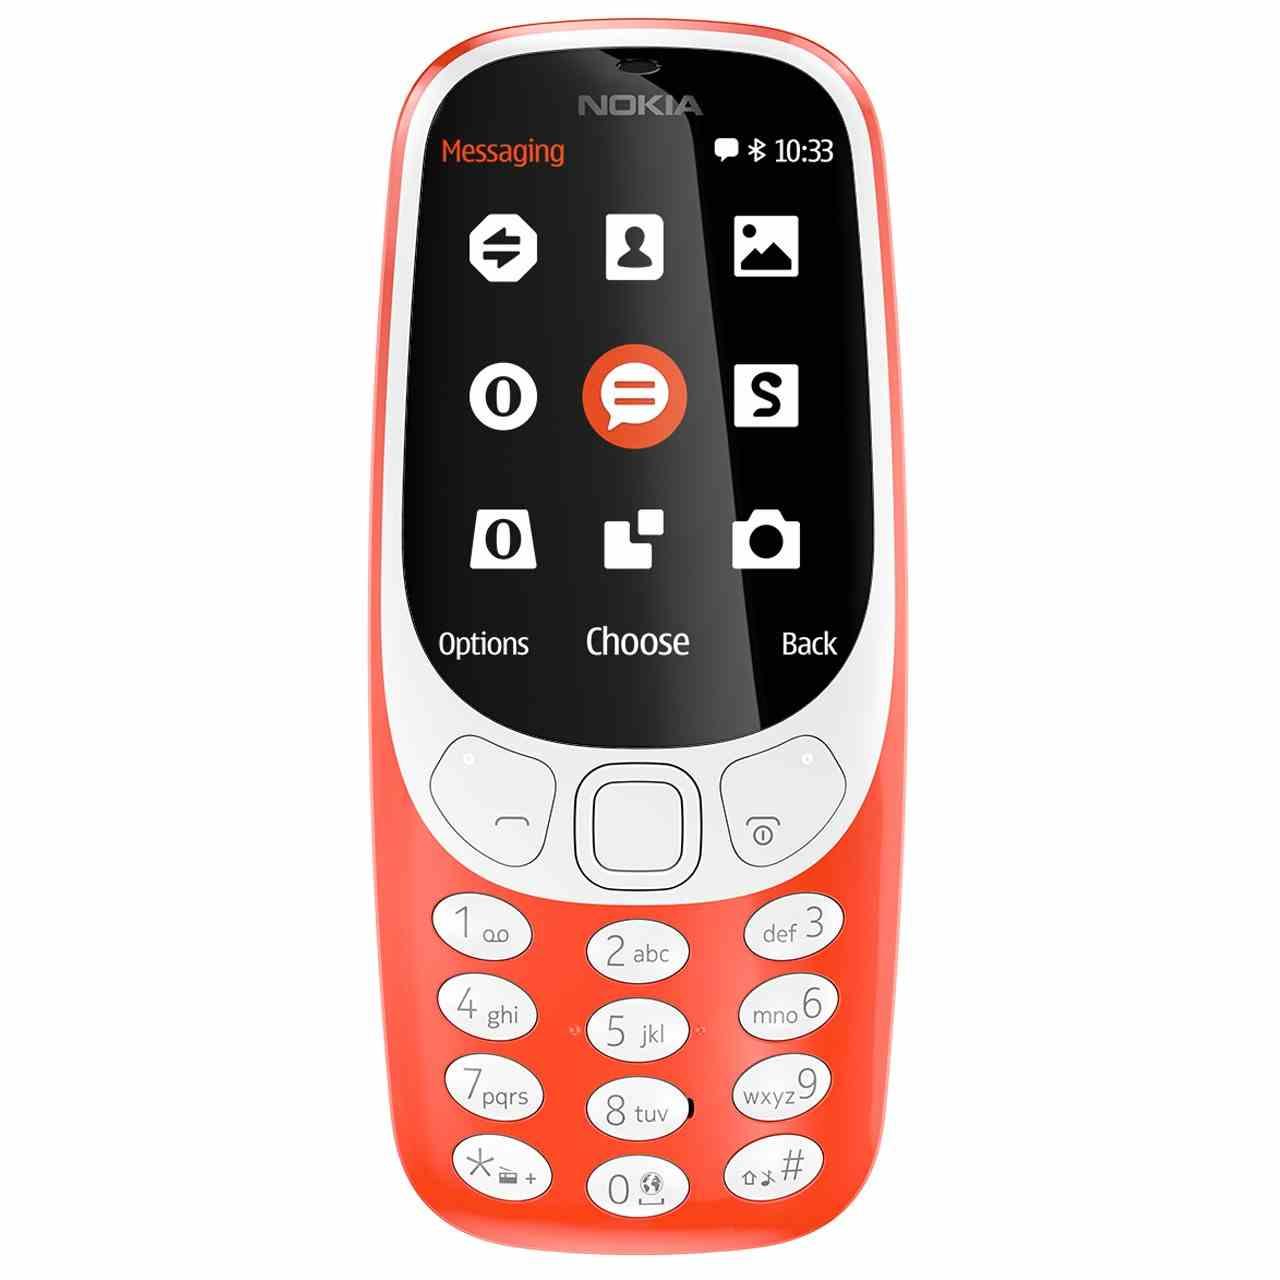 گوشی موبایل نوکیا مدل (2017) 3310 دو سیم کارت